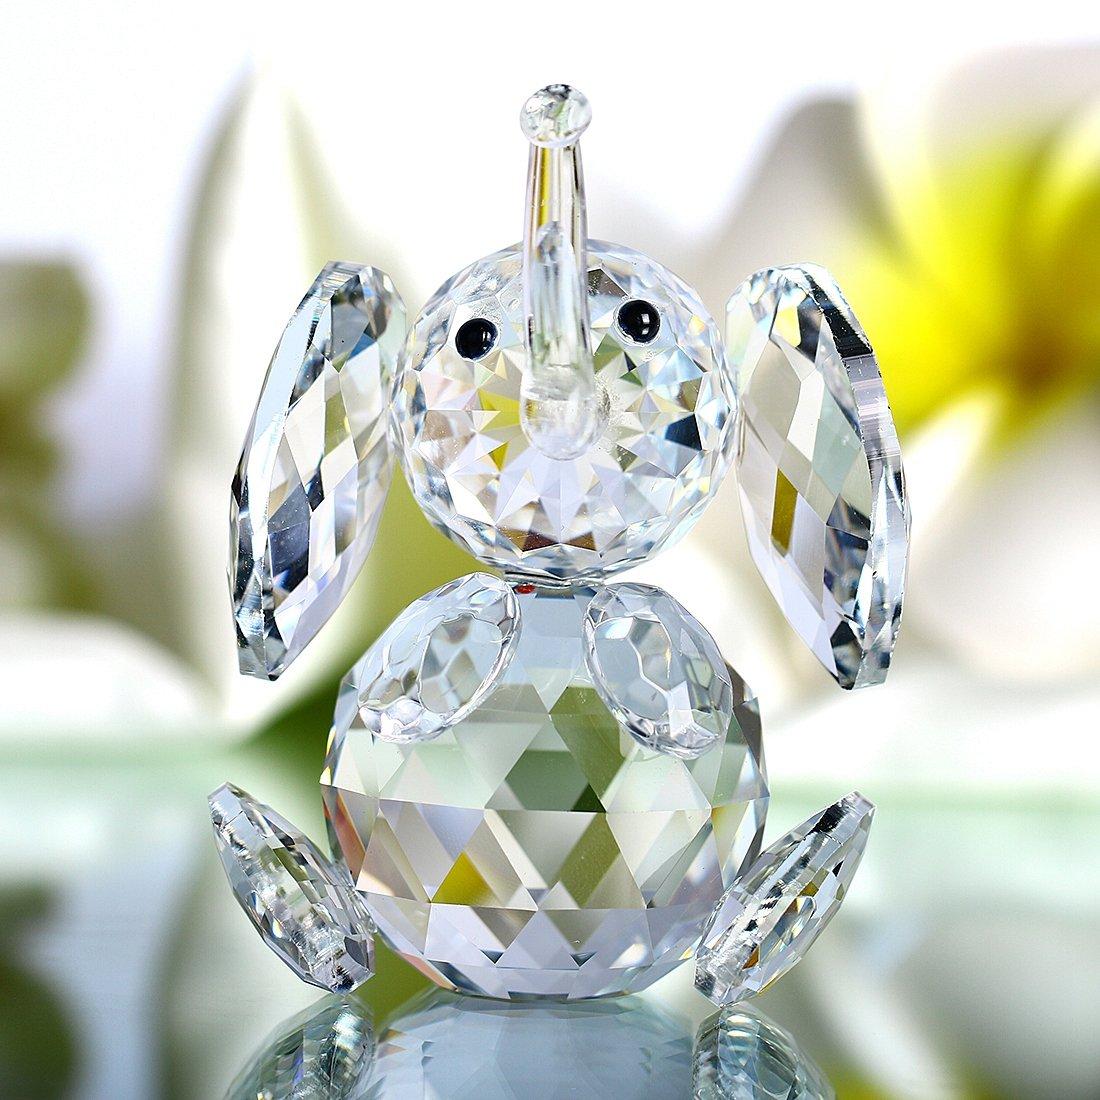 H&D Cut crystal elephant animal figurine collection glass ornament new LTD